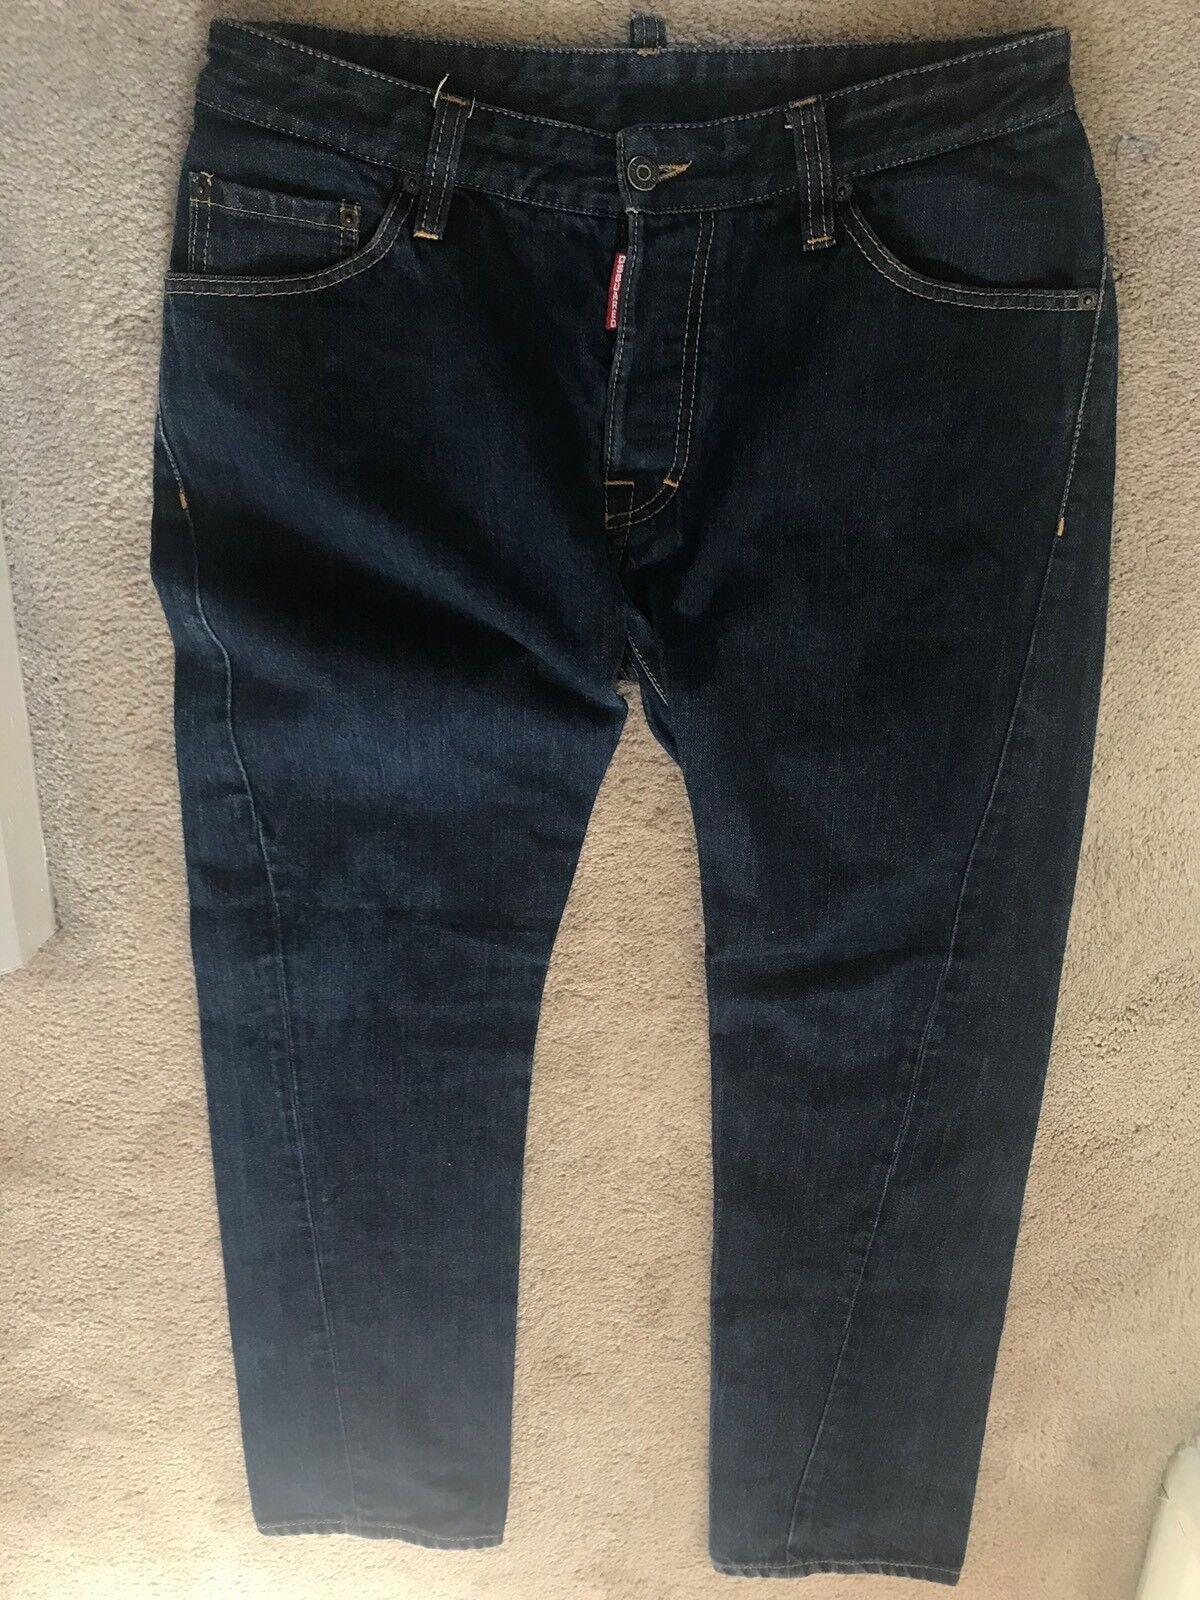 DSQUARED 2 jeans uomo mod 71 LA062 ULTRA RARA Authentic Jeans Denim Nizza